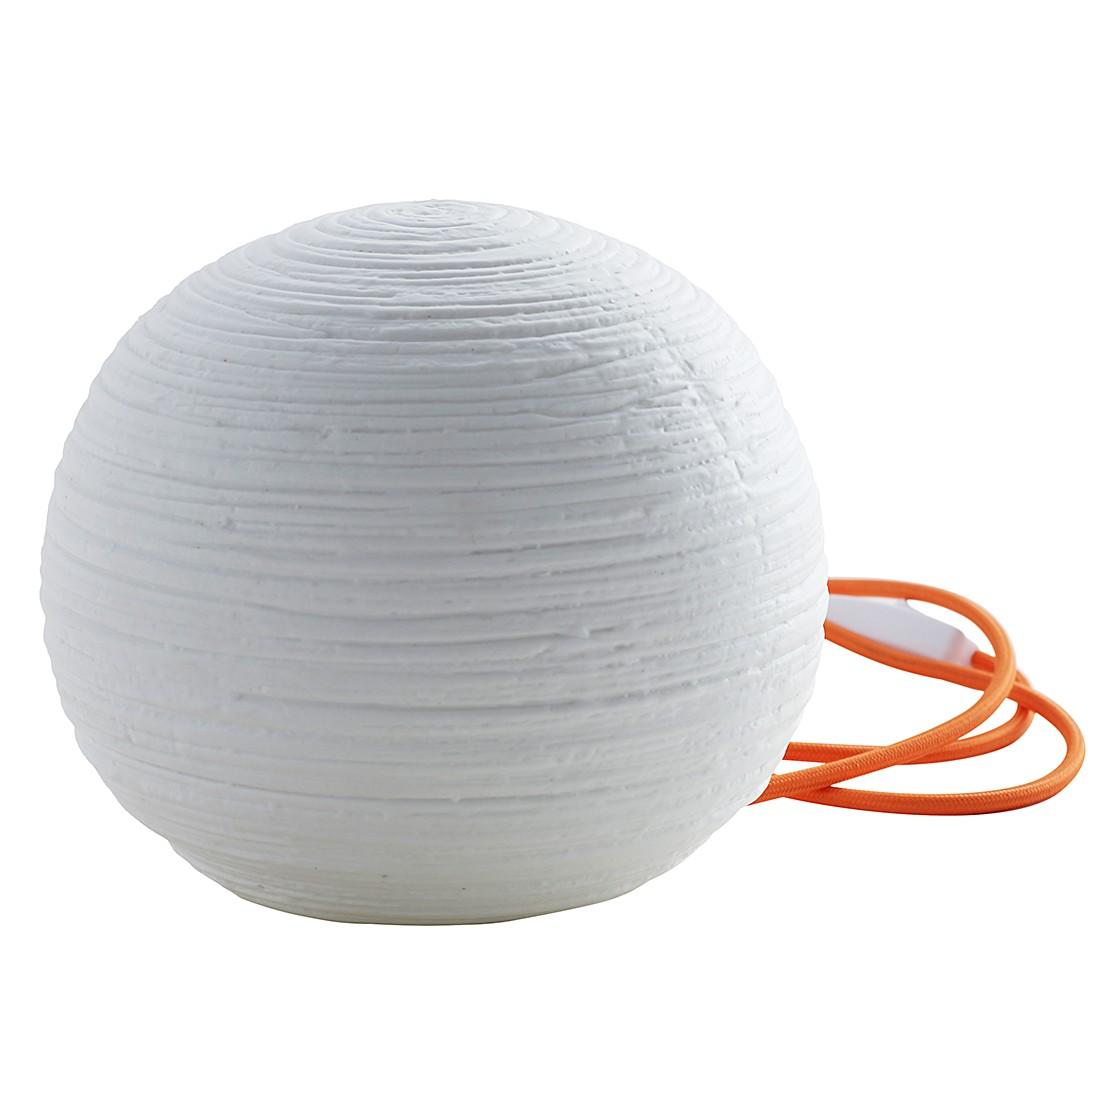 Kugelleuchte Linien – Porzellan – 1-flammig, Serax bestellen